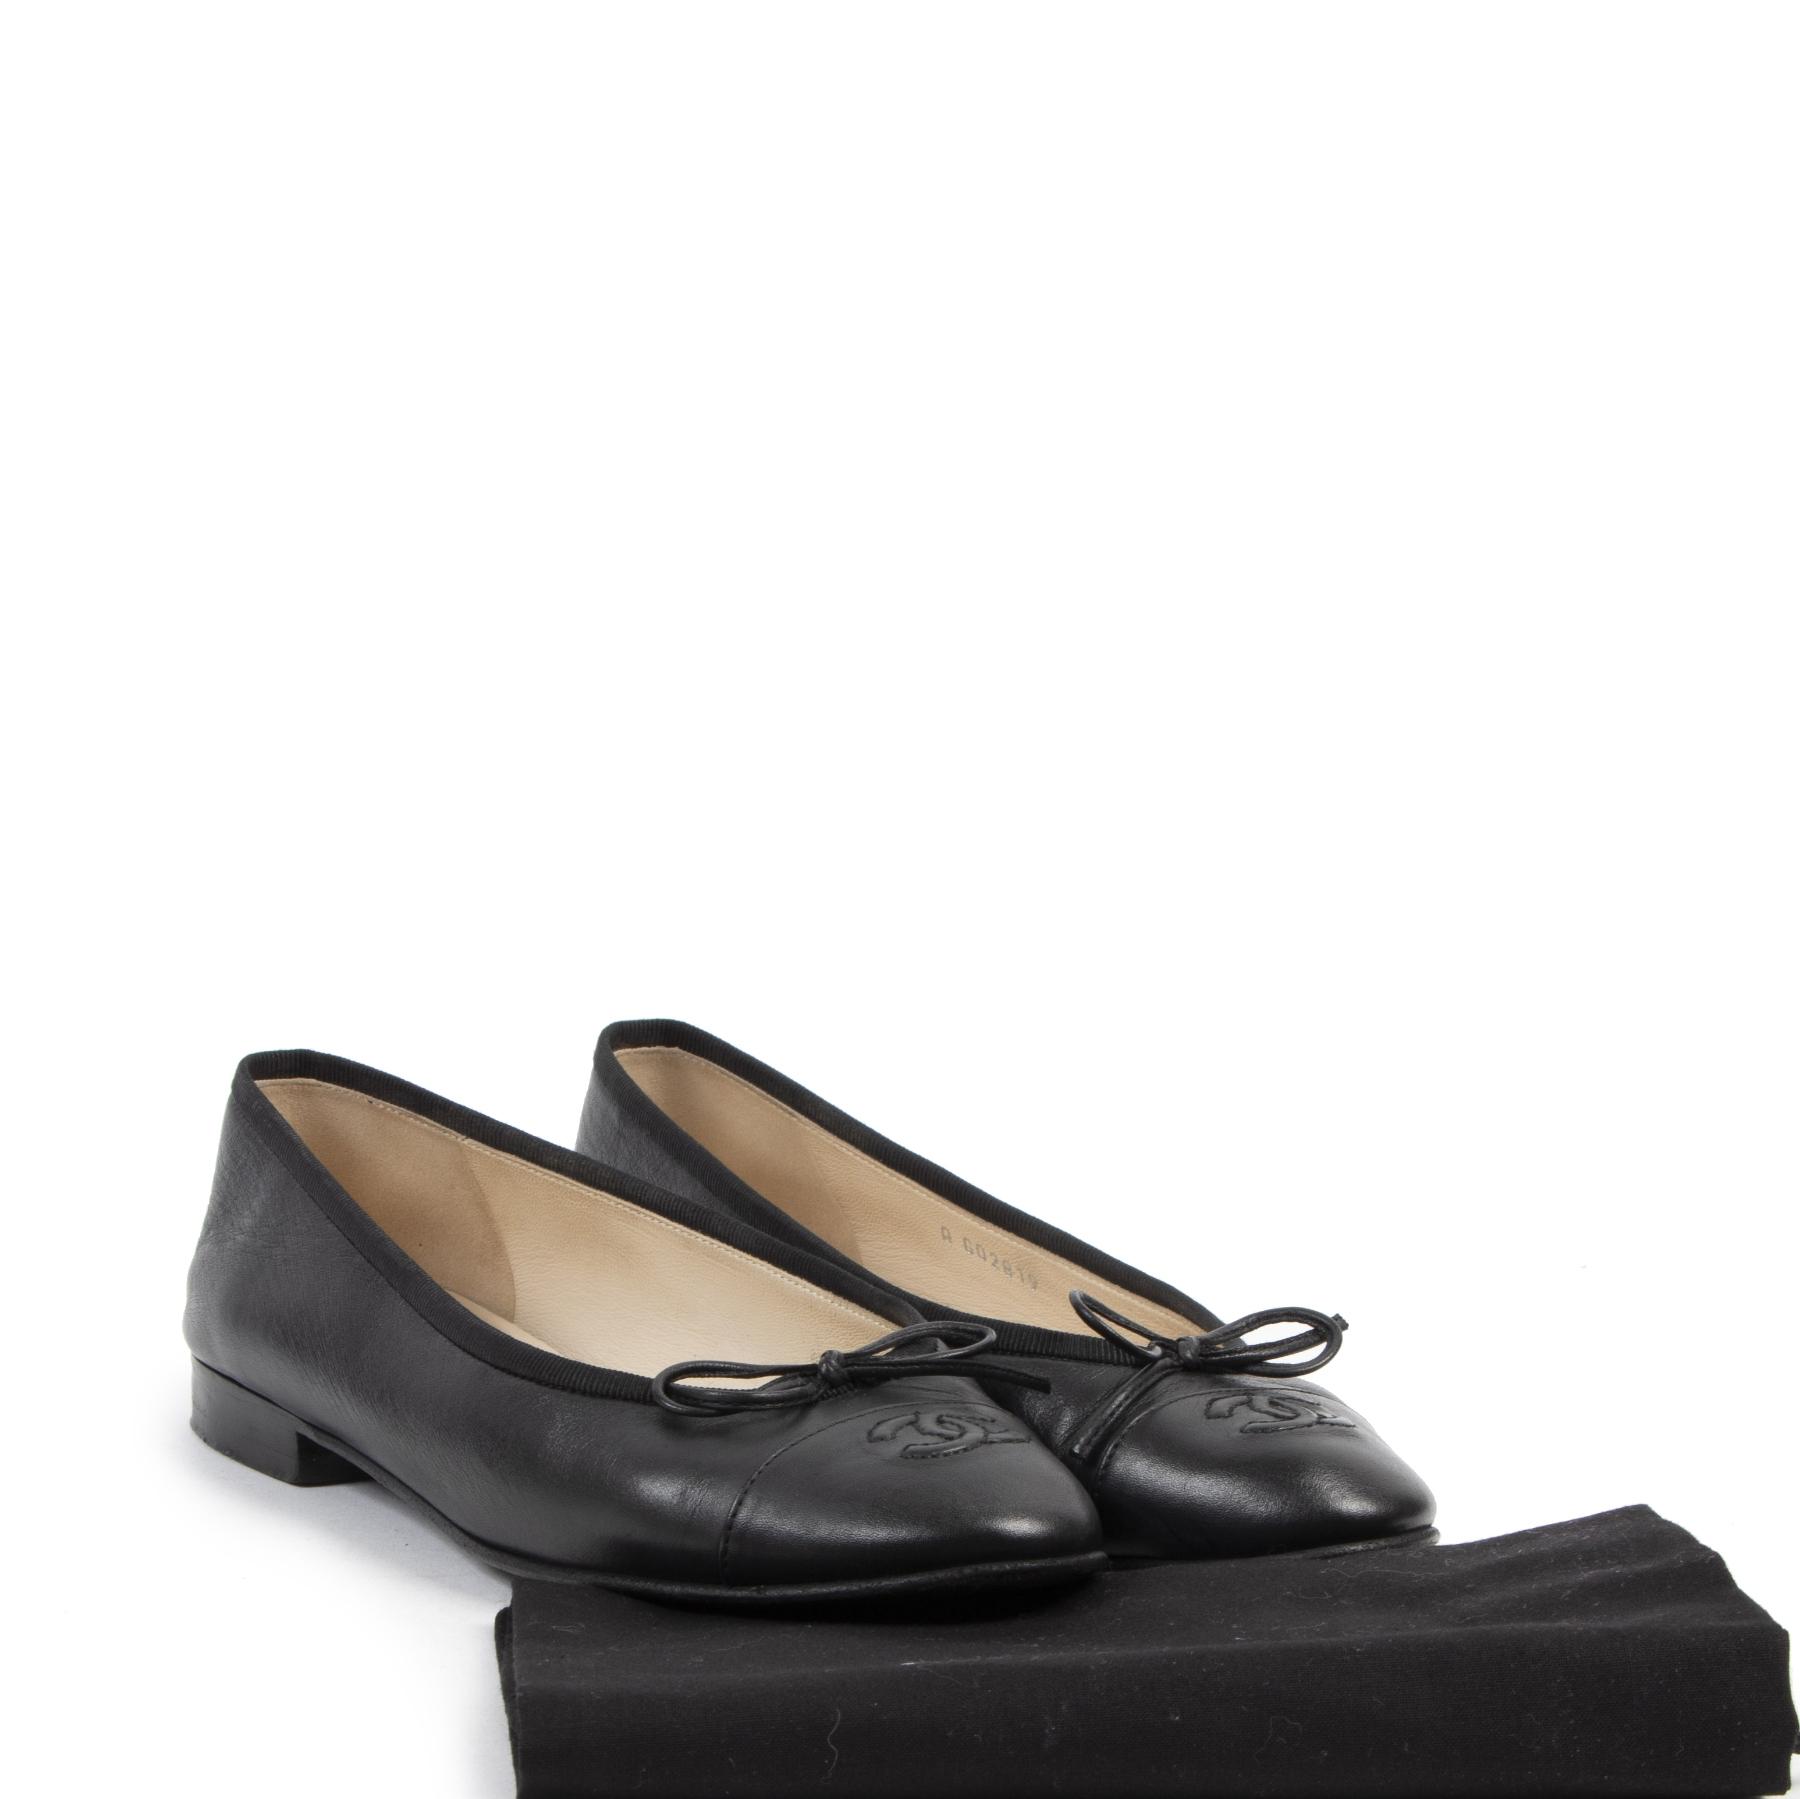 Authentieke tweedehands vintage Chanel Black Leather Flats - Size 37,5 Koop online webshop LabelLOV